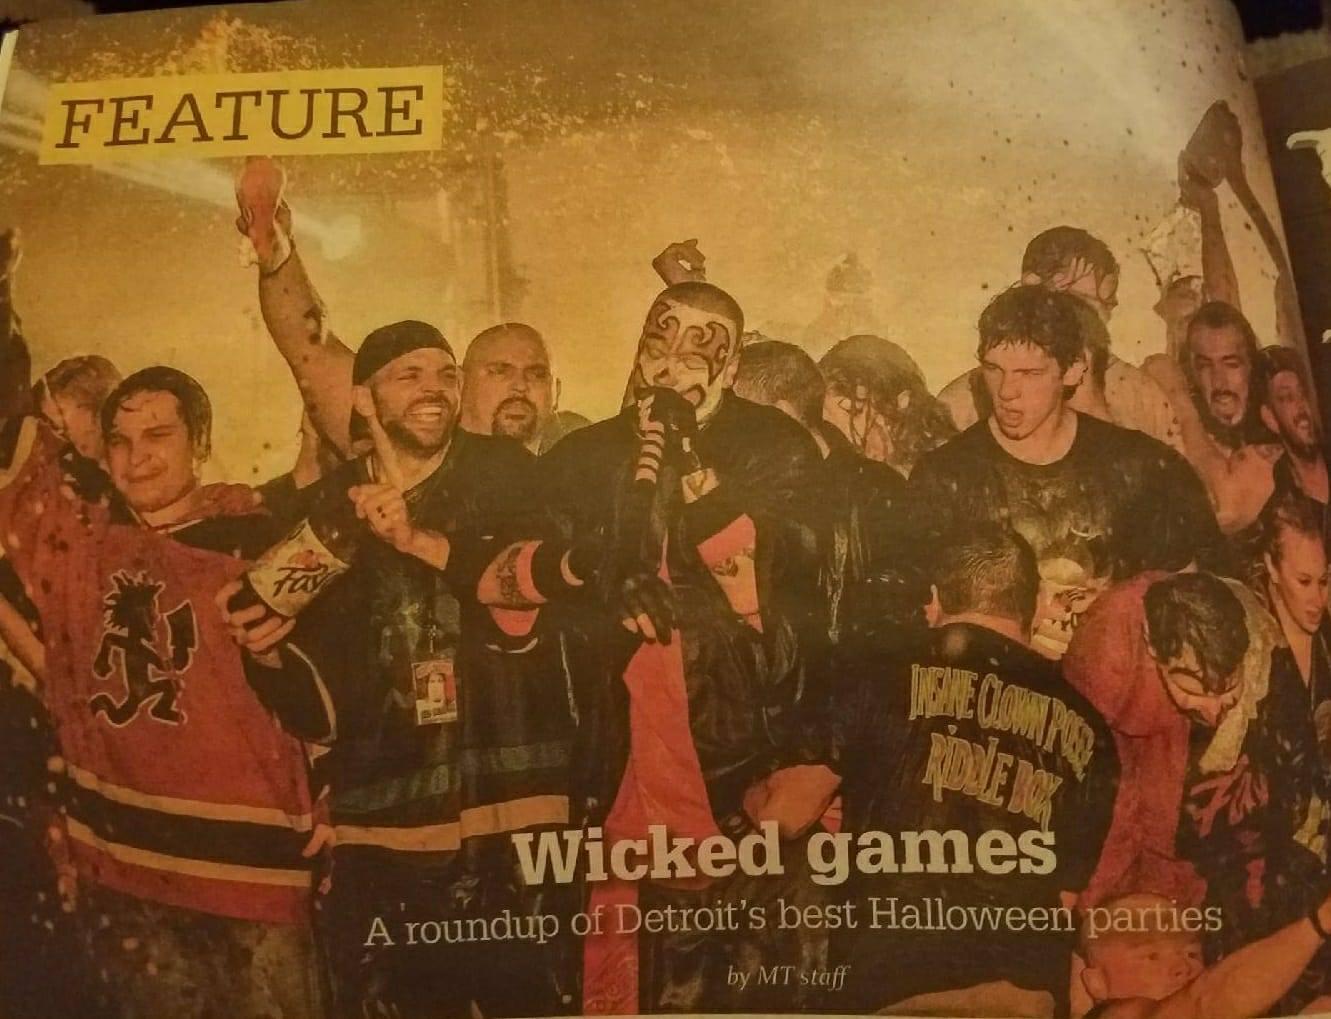 detroit's metro times covers detroit's best halloween parties